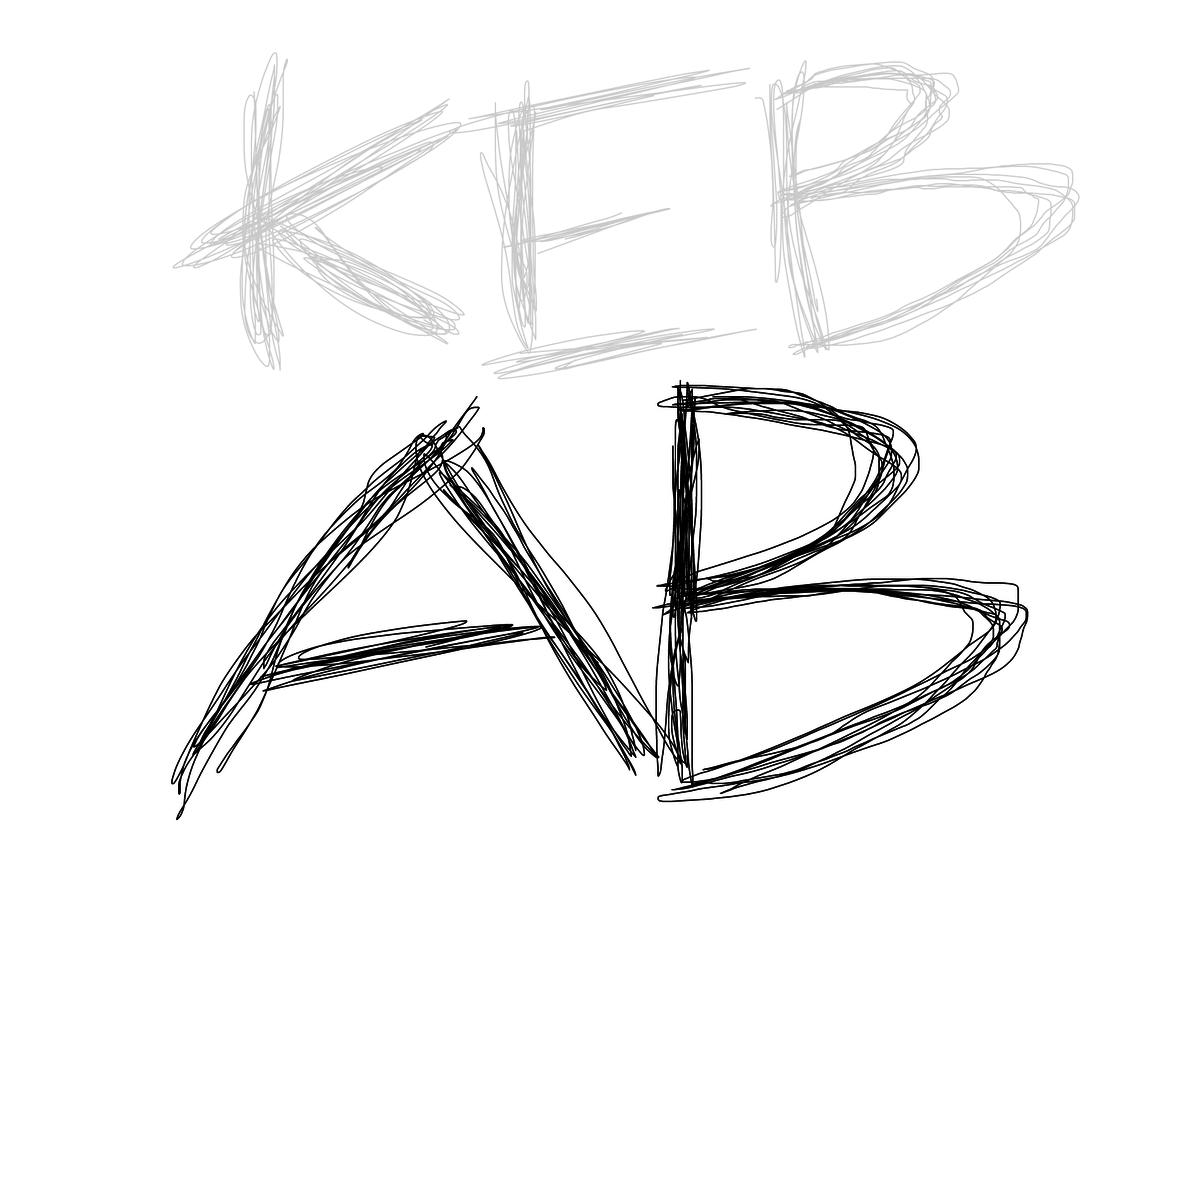 BAAAM drawing#8578 lat:59.9234123229980500lng: 10.7575759887695310